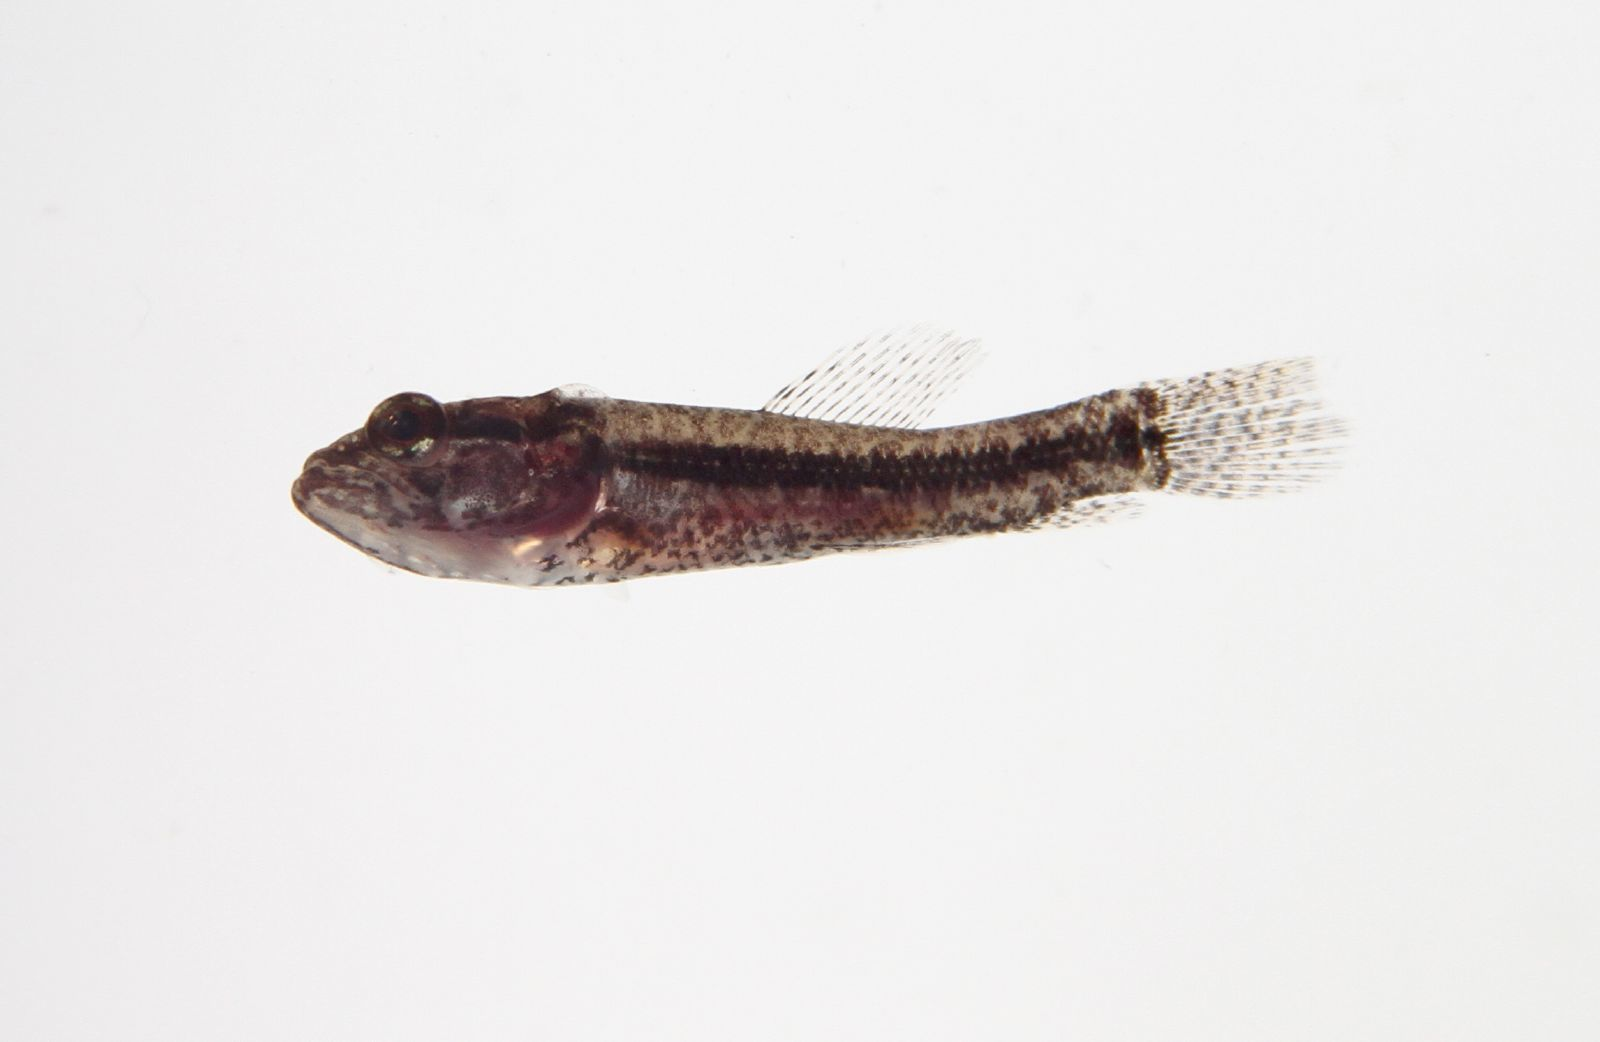 Image of tigerfish